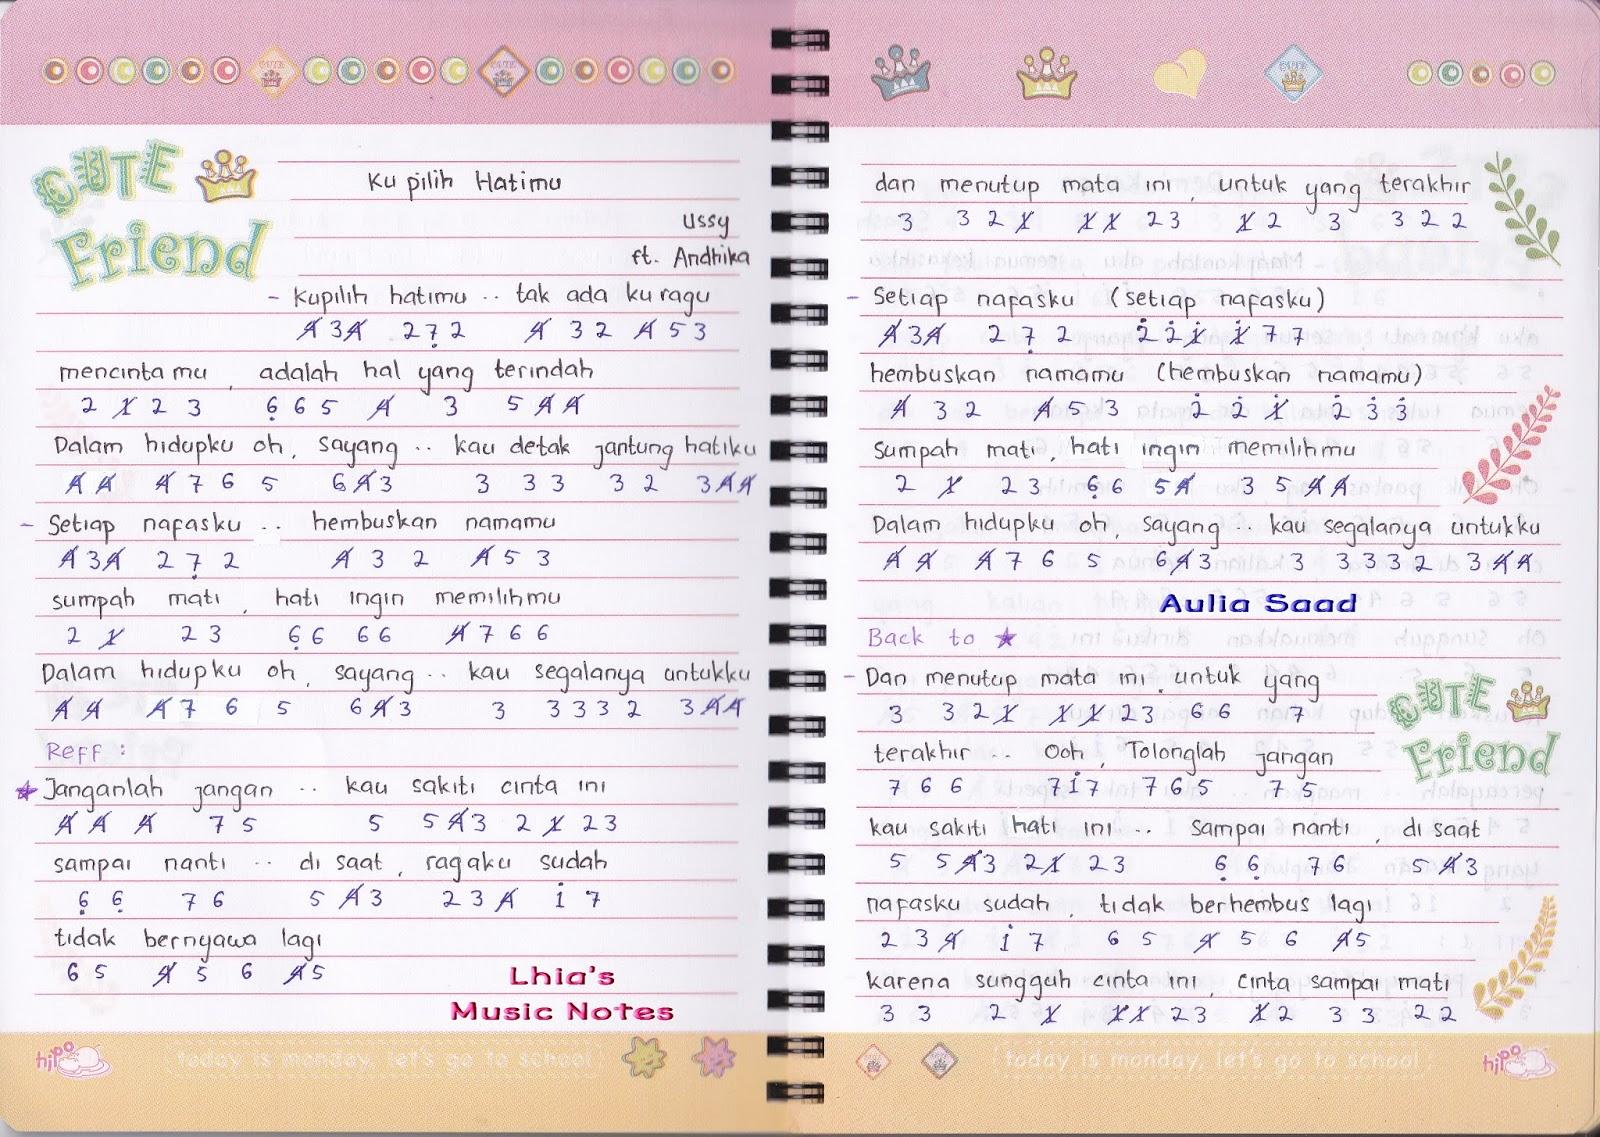 Lagu Kenangan Indonesia Terpopuler Lirik Lagu Lyrics | Share The ...